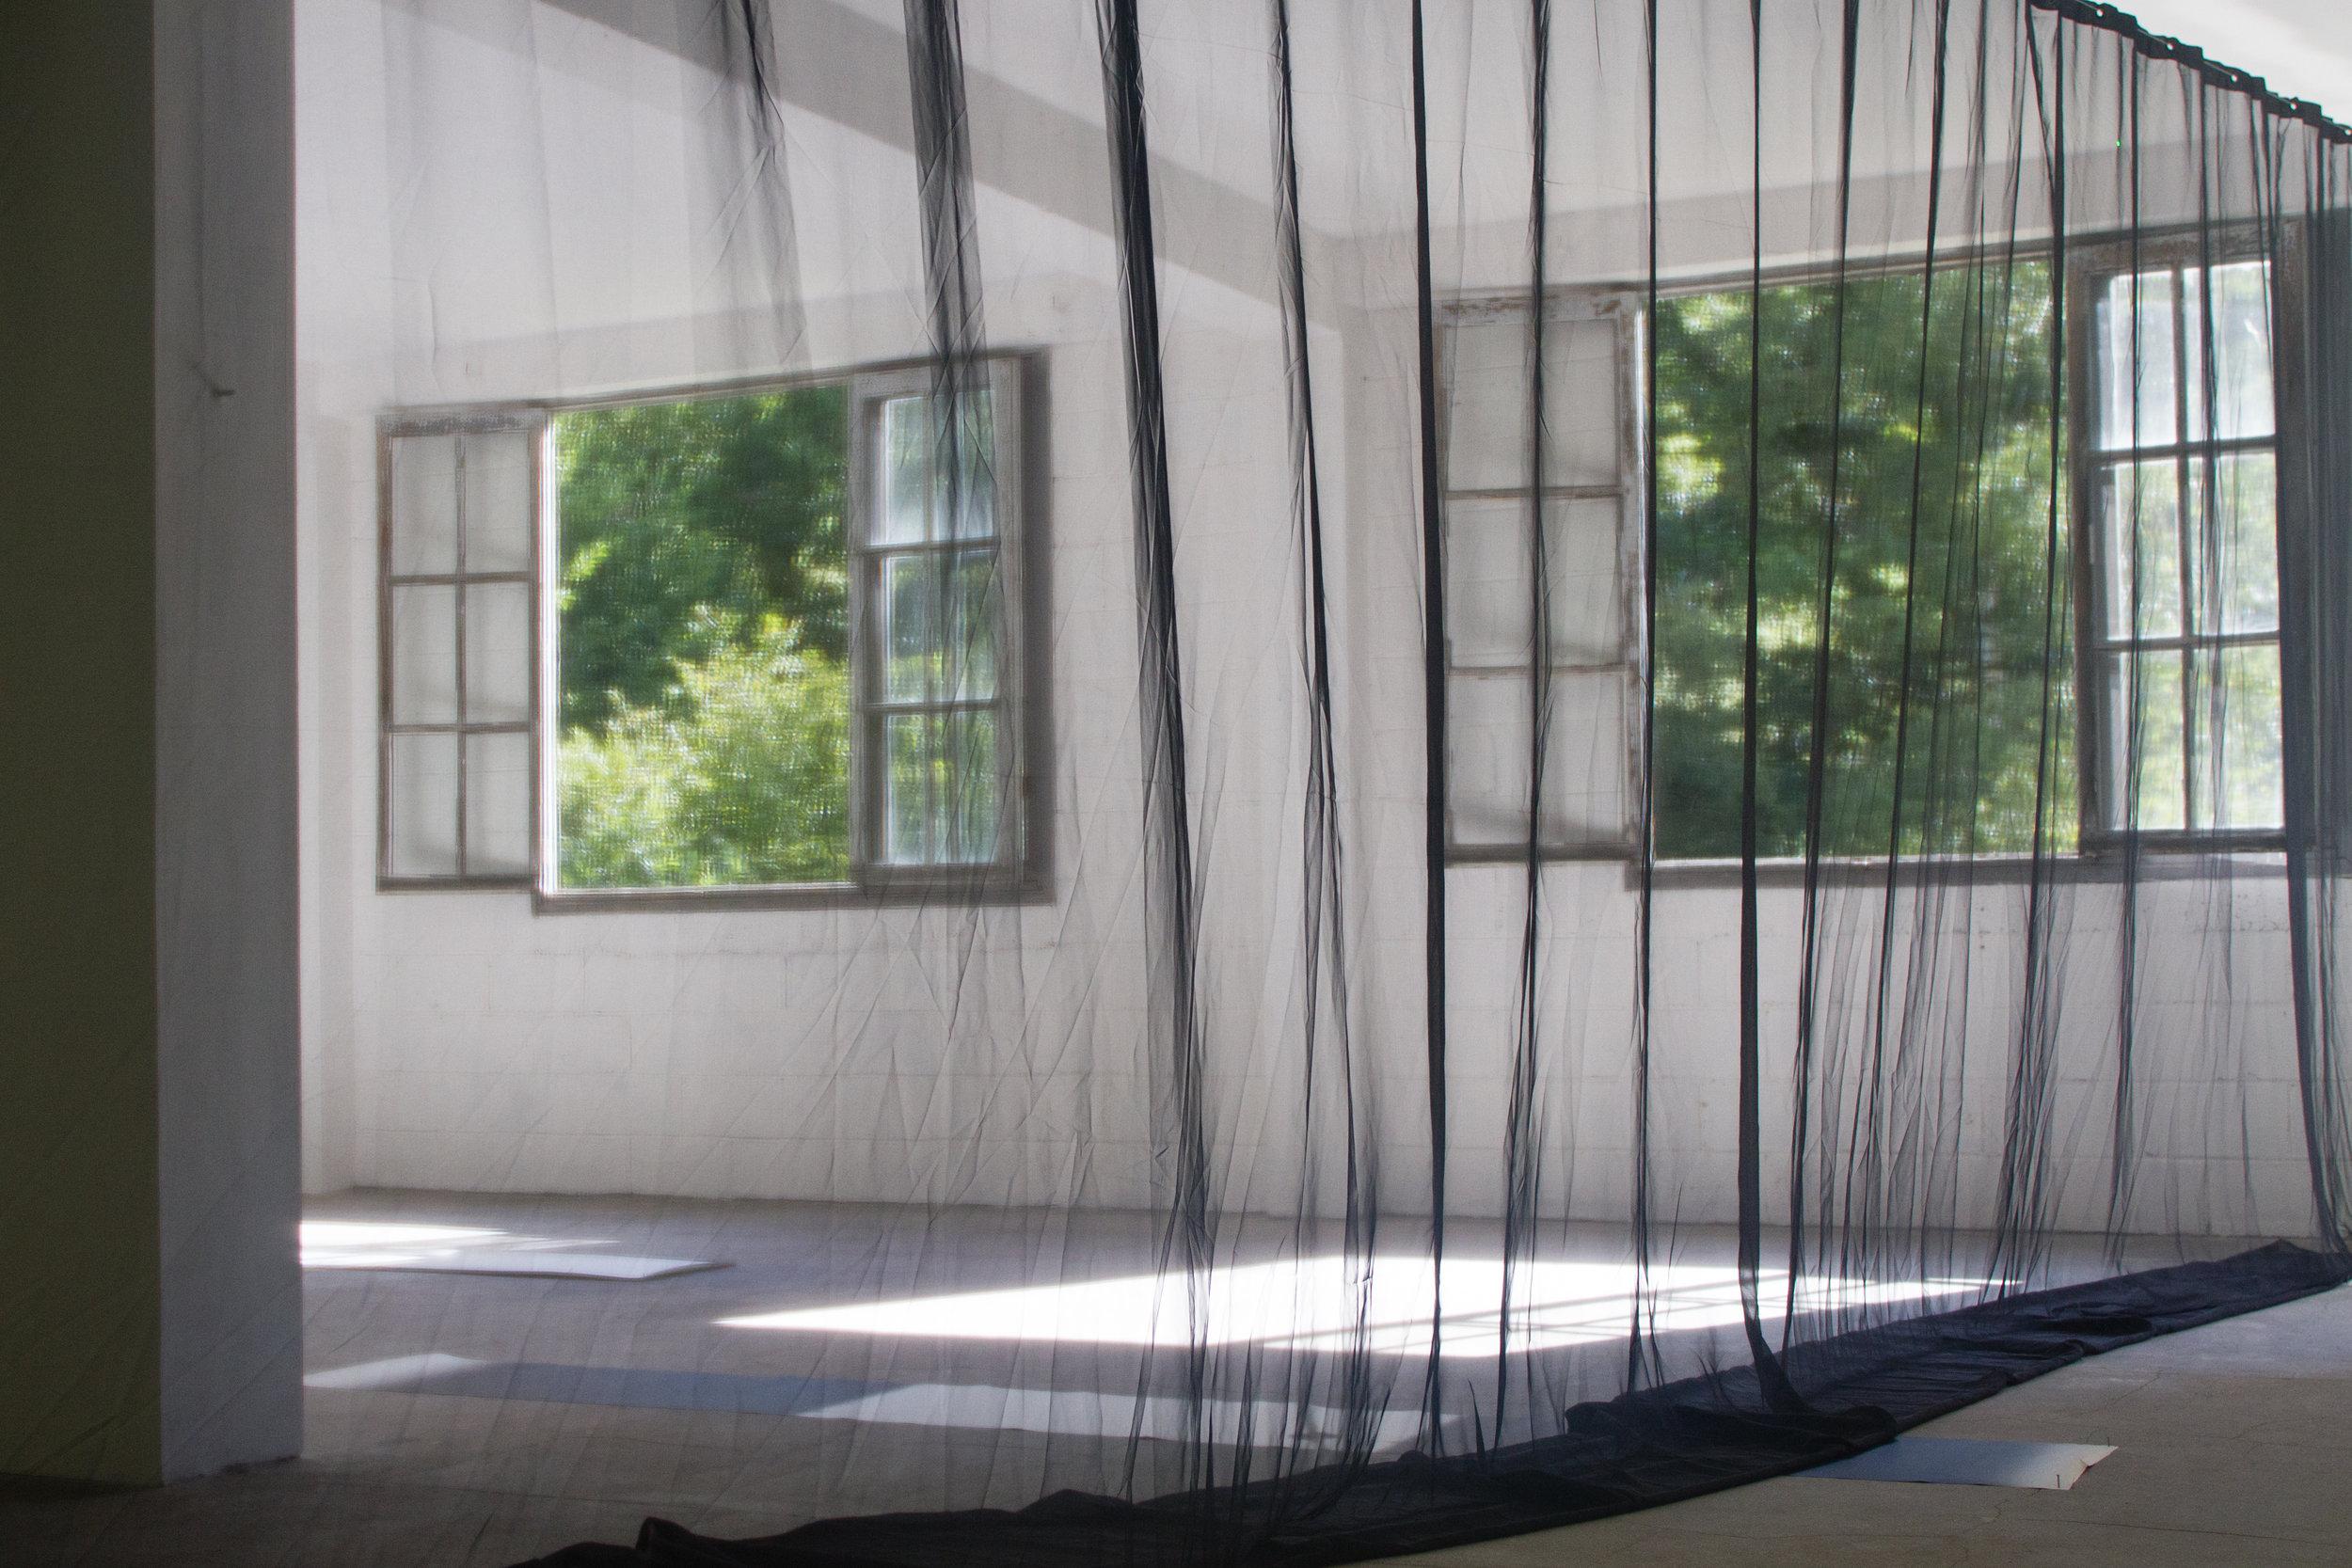 Jason Hendrik Hansma,  Éclisse , 2018, Chiffon curtaining and 200 milliwatt laser, 400 x 1000 cm into 288 x 940 cm